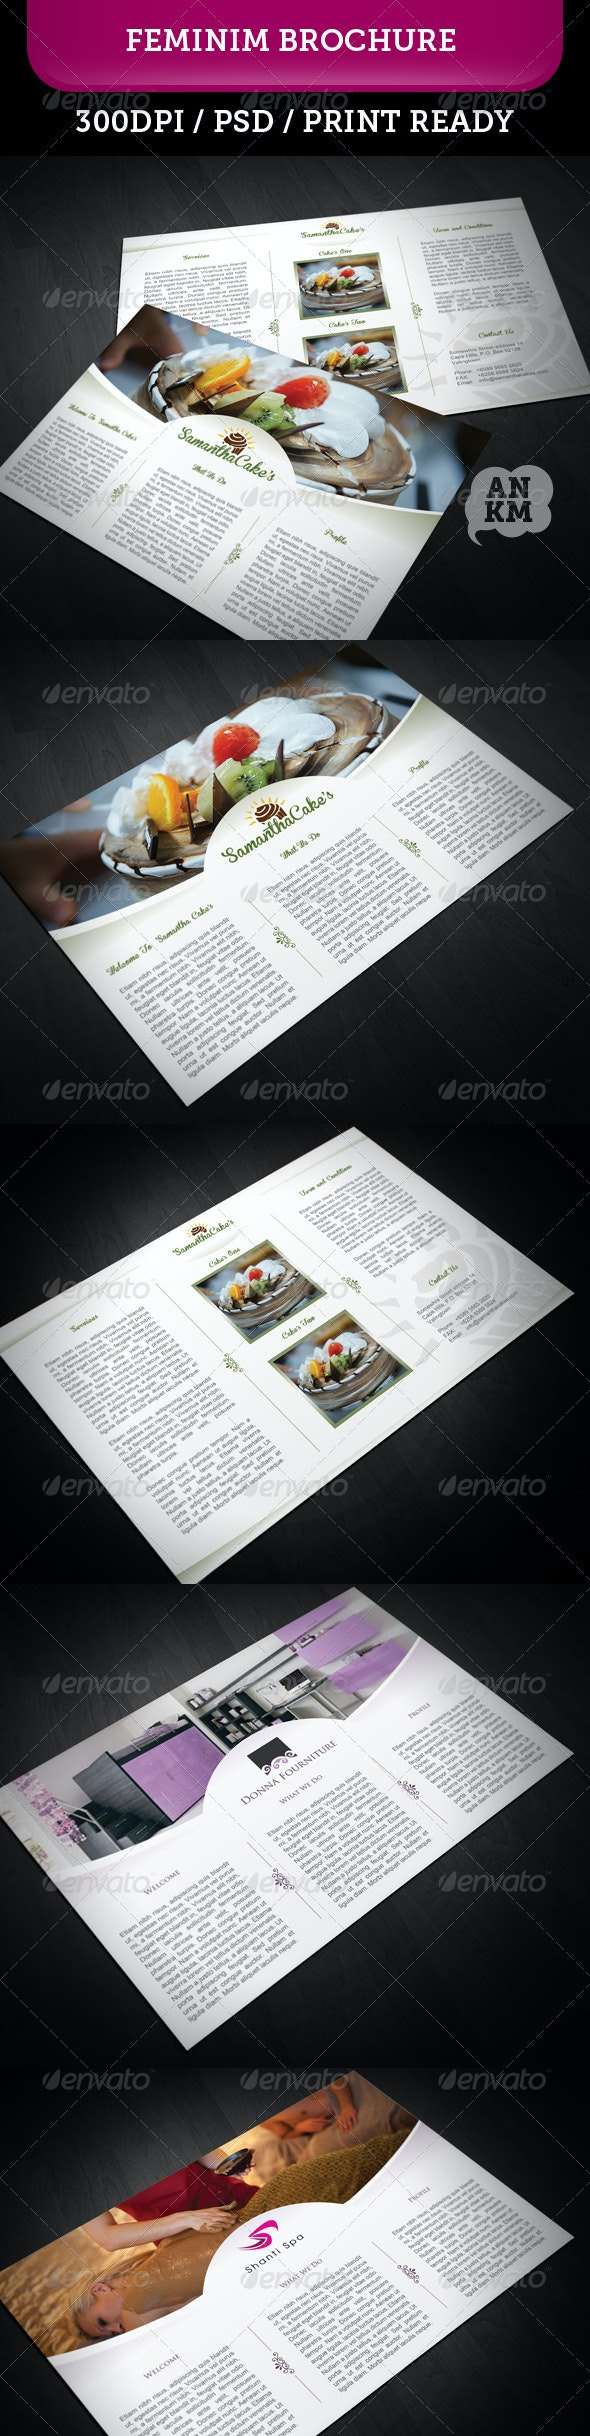 Feminim Brochure - Brochures Print Templates